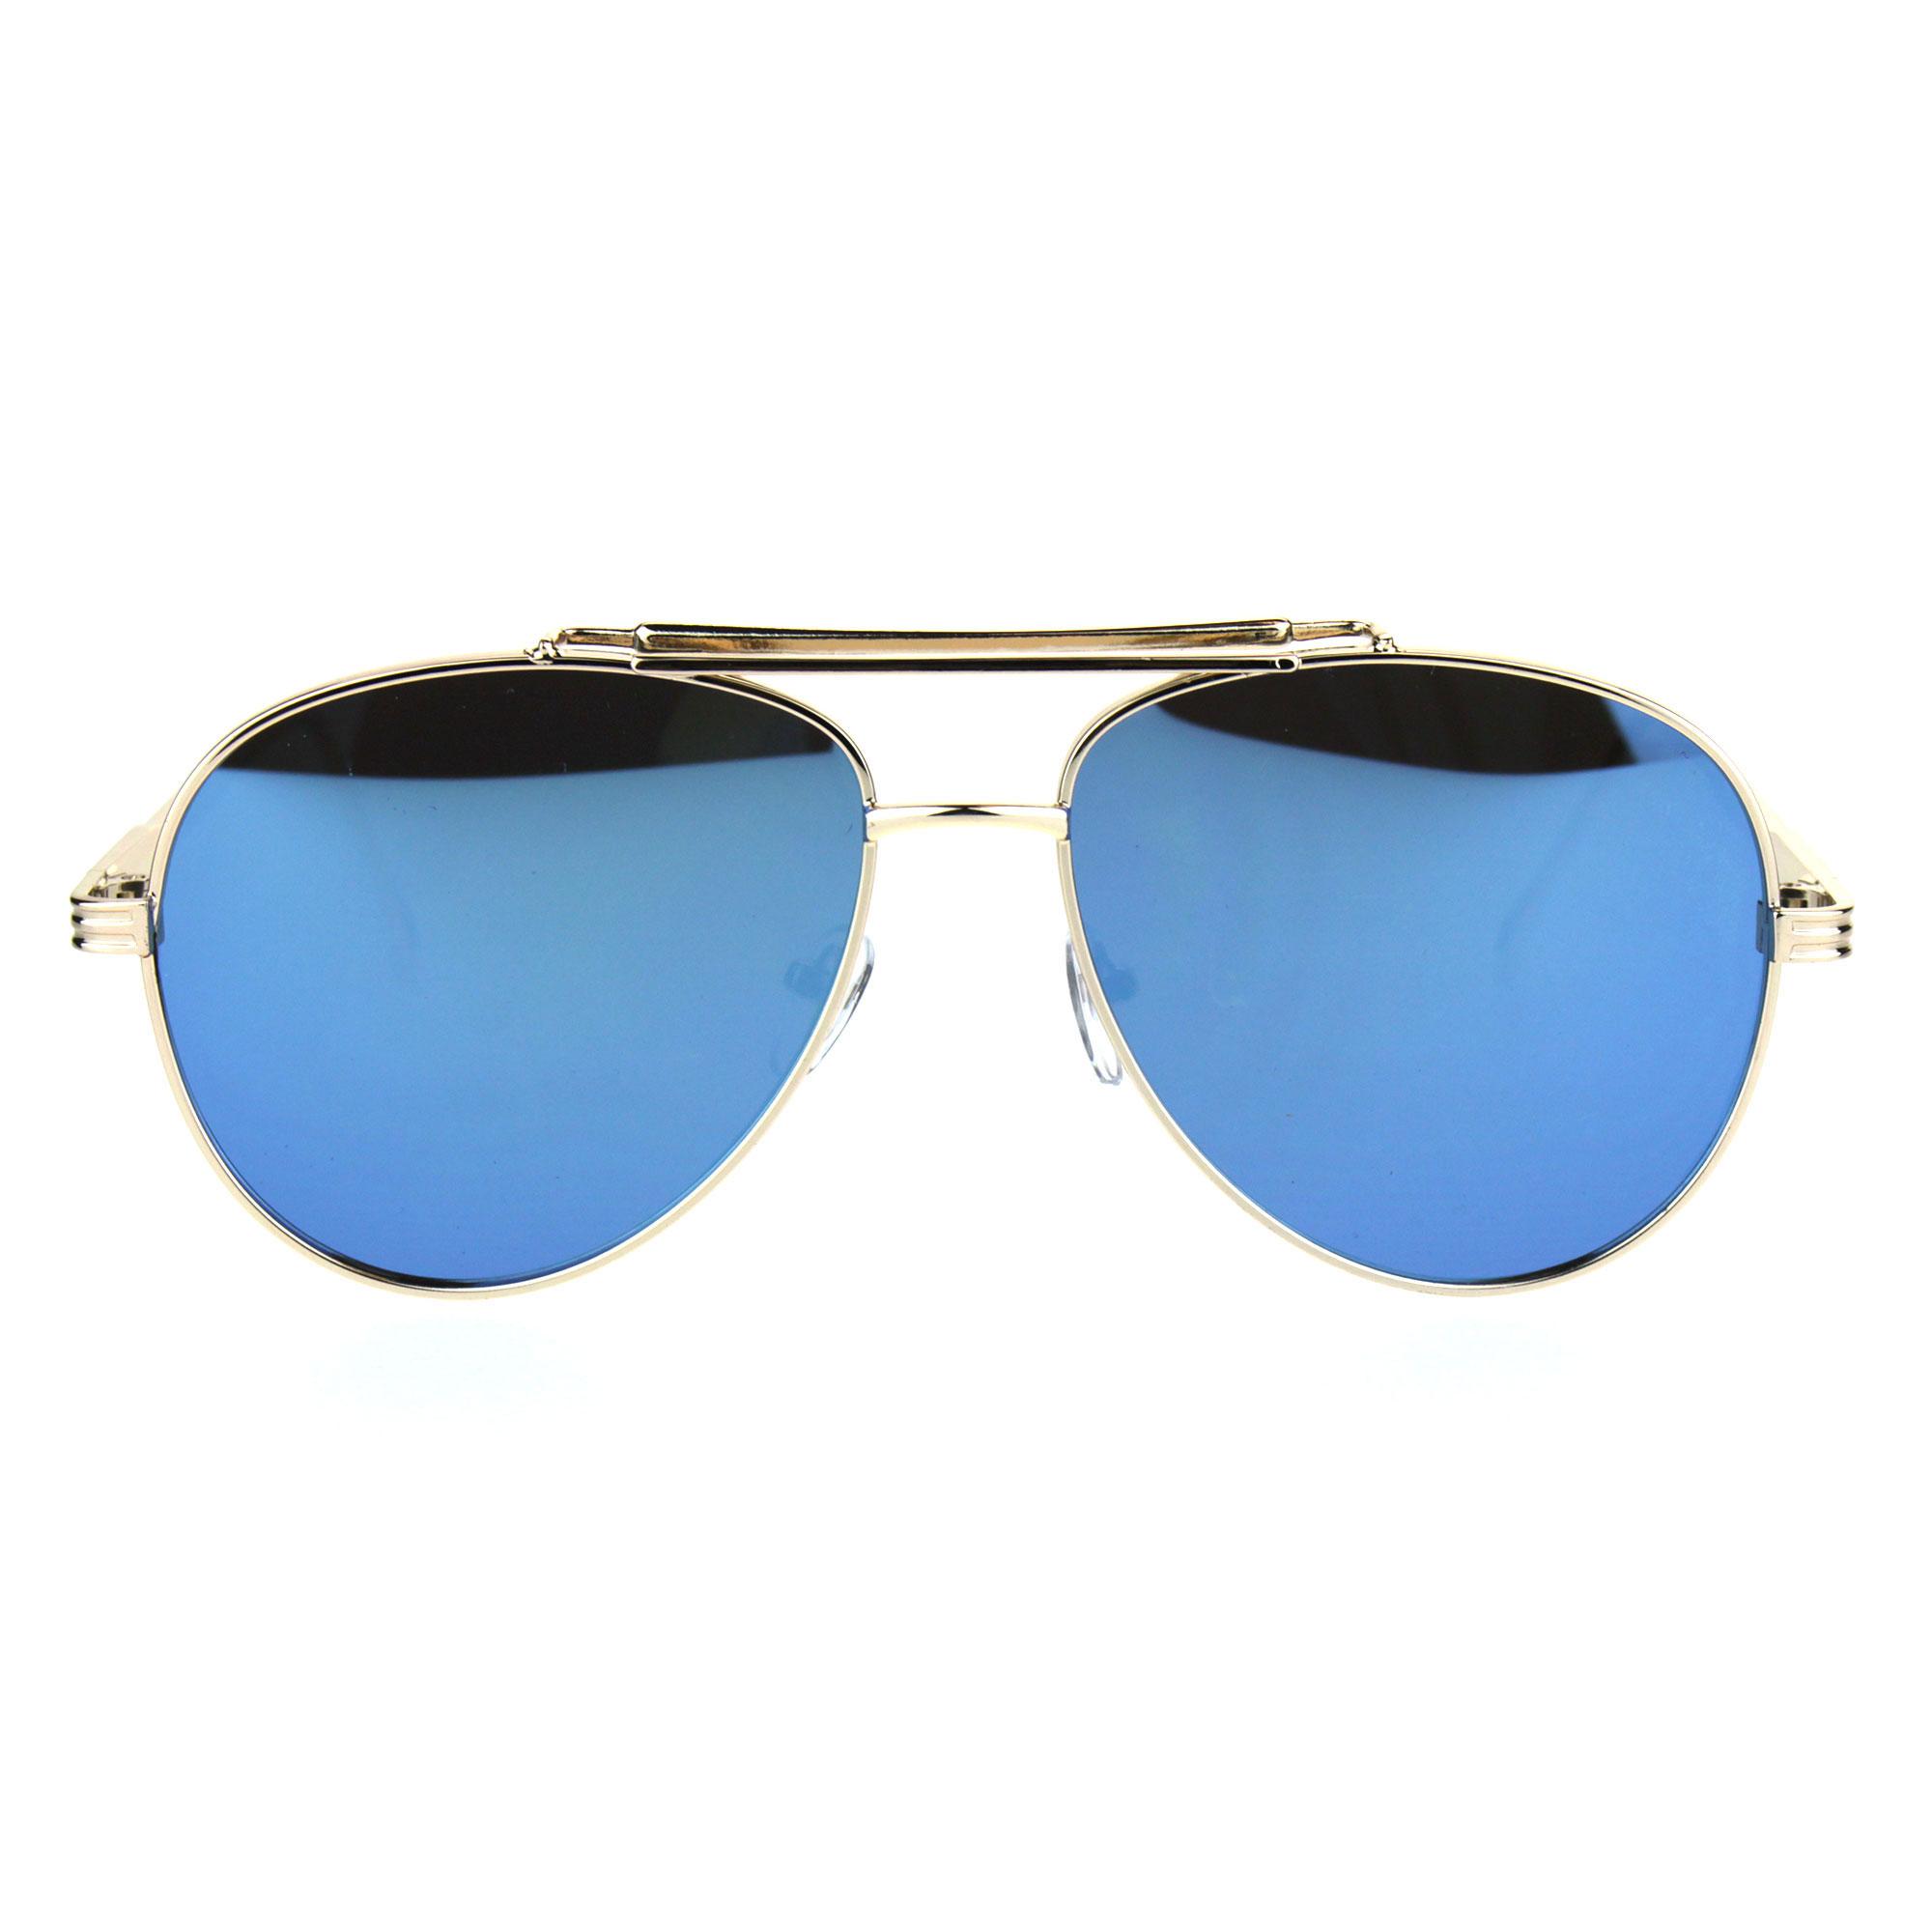 Mens Designer Aviator Sunglasses Sale  c5fa586a8053